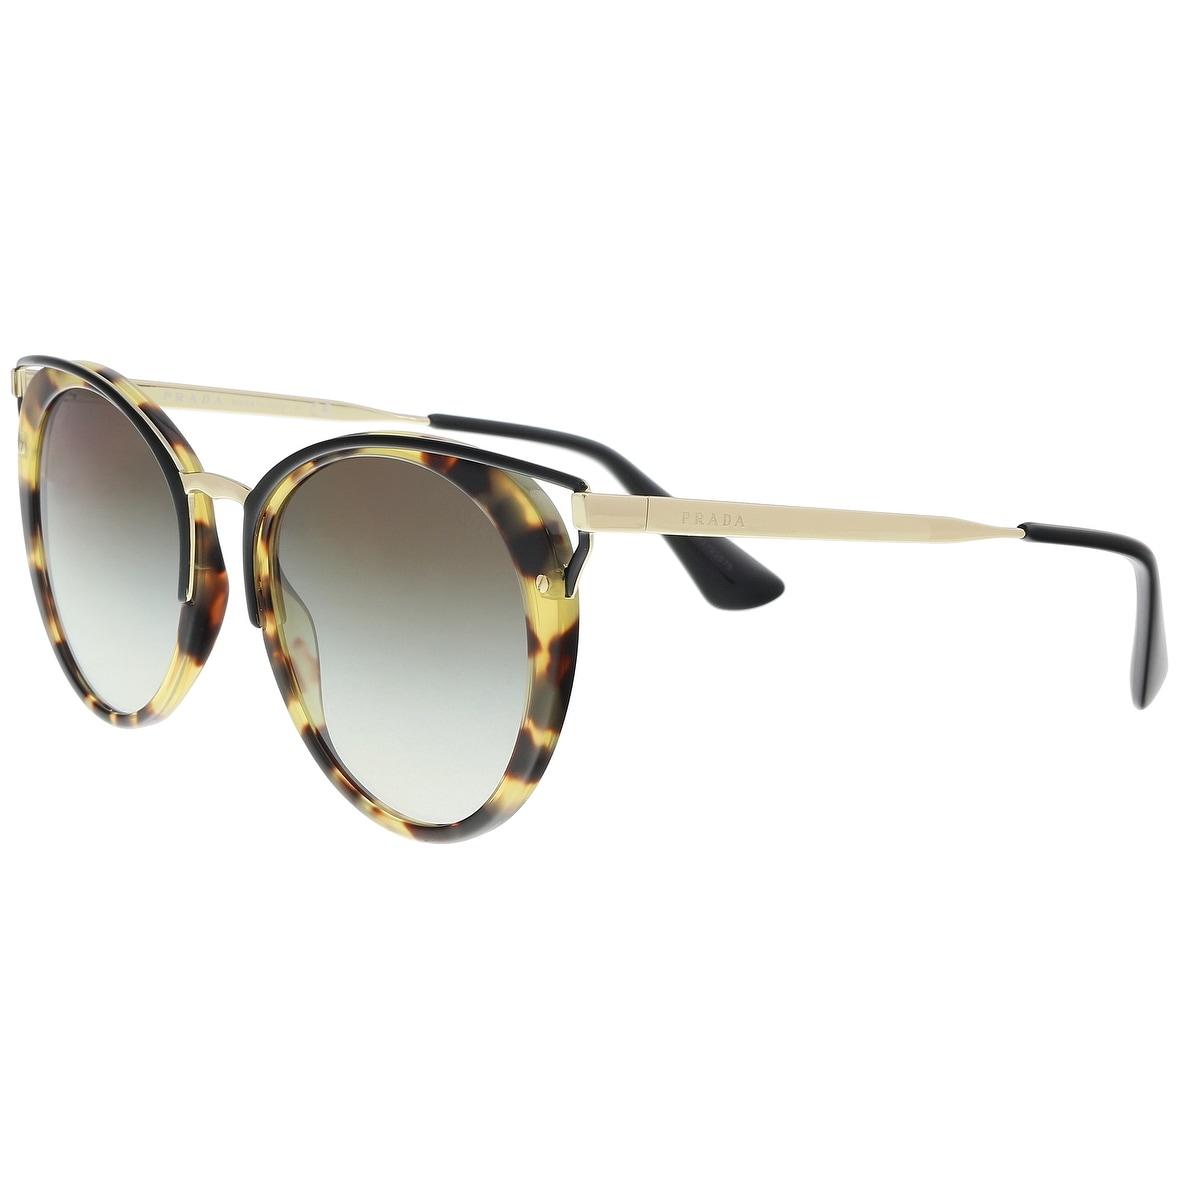 0e44706daf Cateye Prada Women s Sunglasses